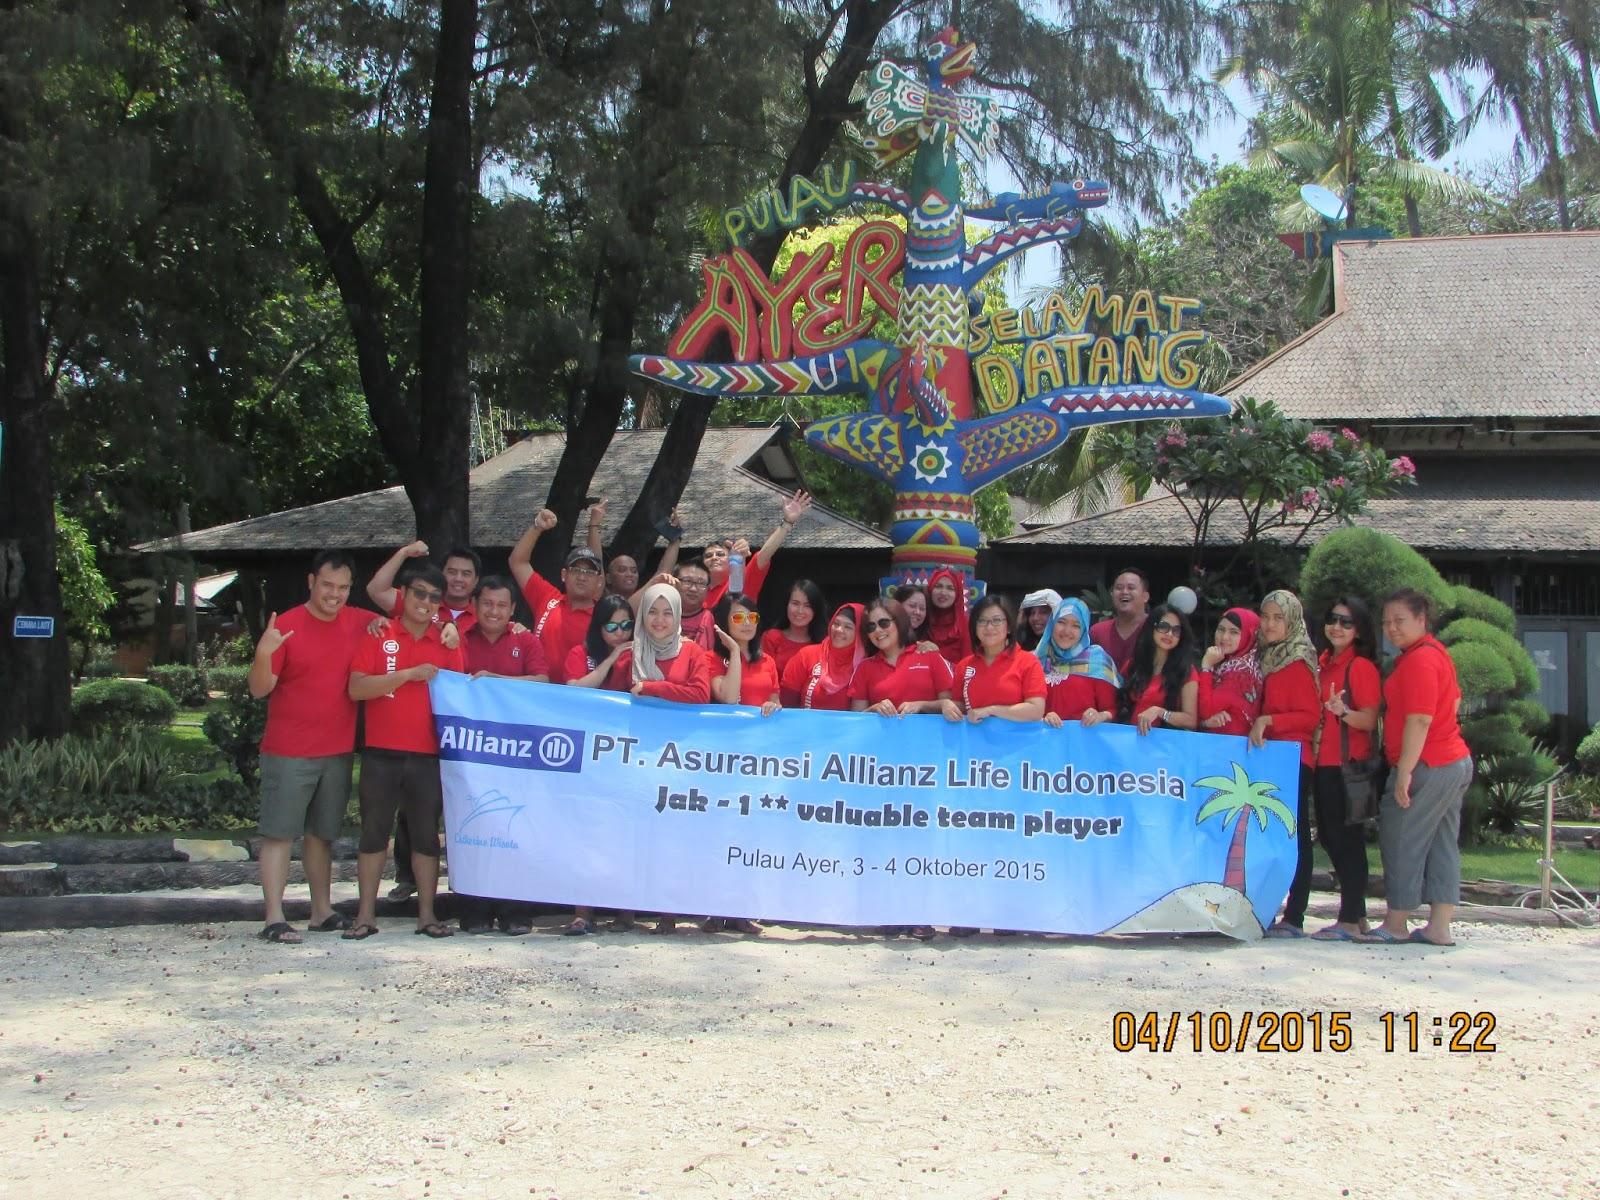 PT. Asuransi Allianz Life Indonesia At Pulau Ayer 3 - 4 ...